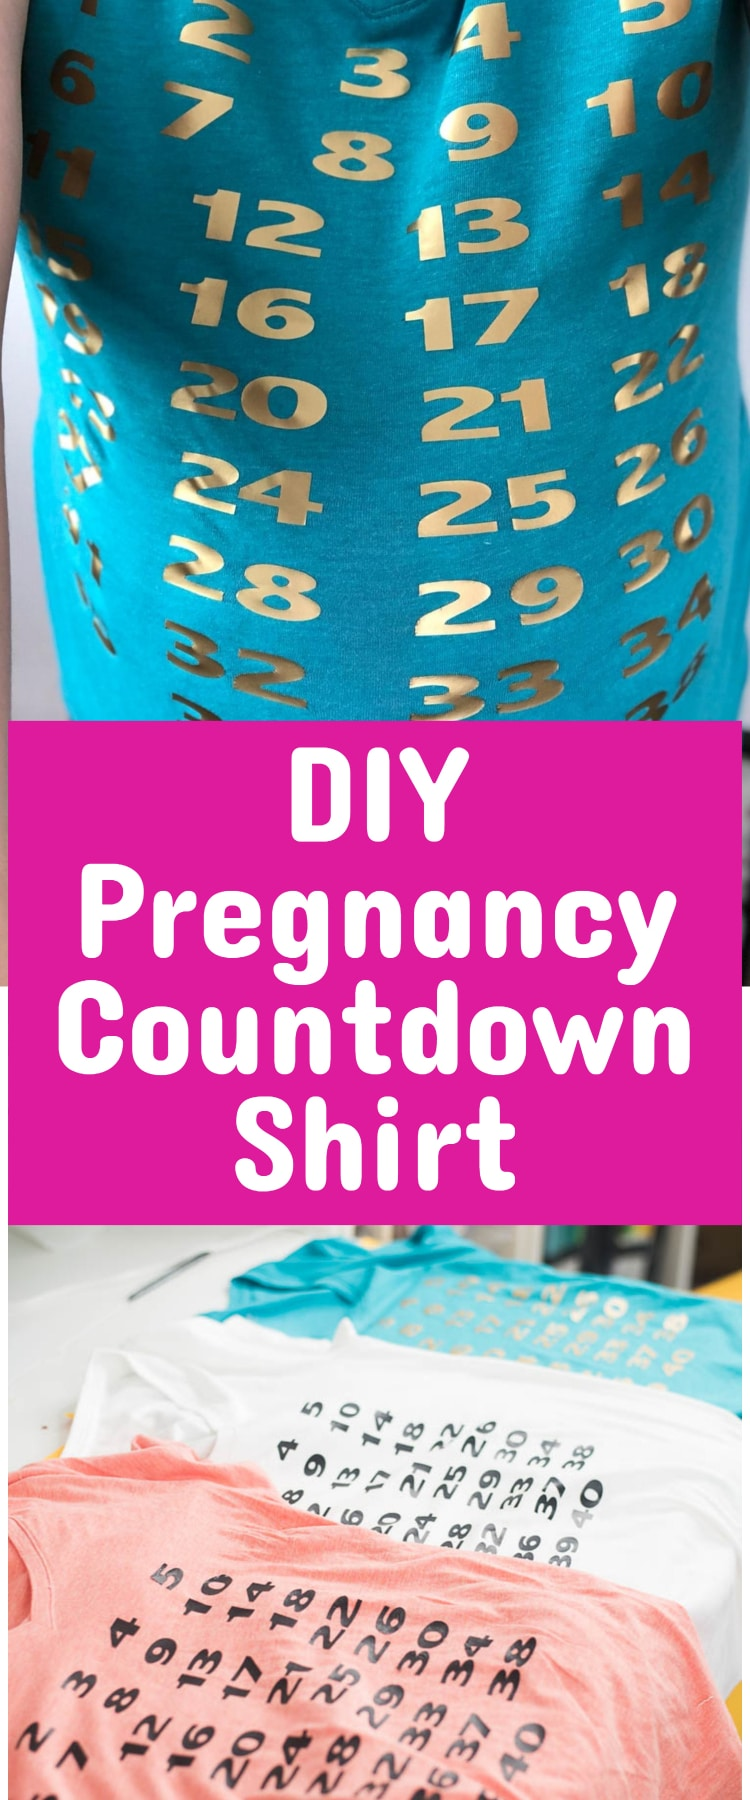 pregnancy wear / maternity clothes / pregnancy countdown / pregnancy shirts / diy / cricut maker / #Pregnant #pregnancy #cricut via @clarkscondensed